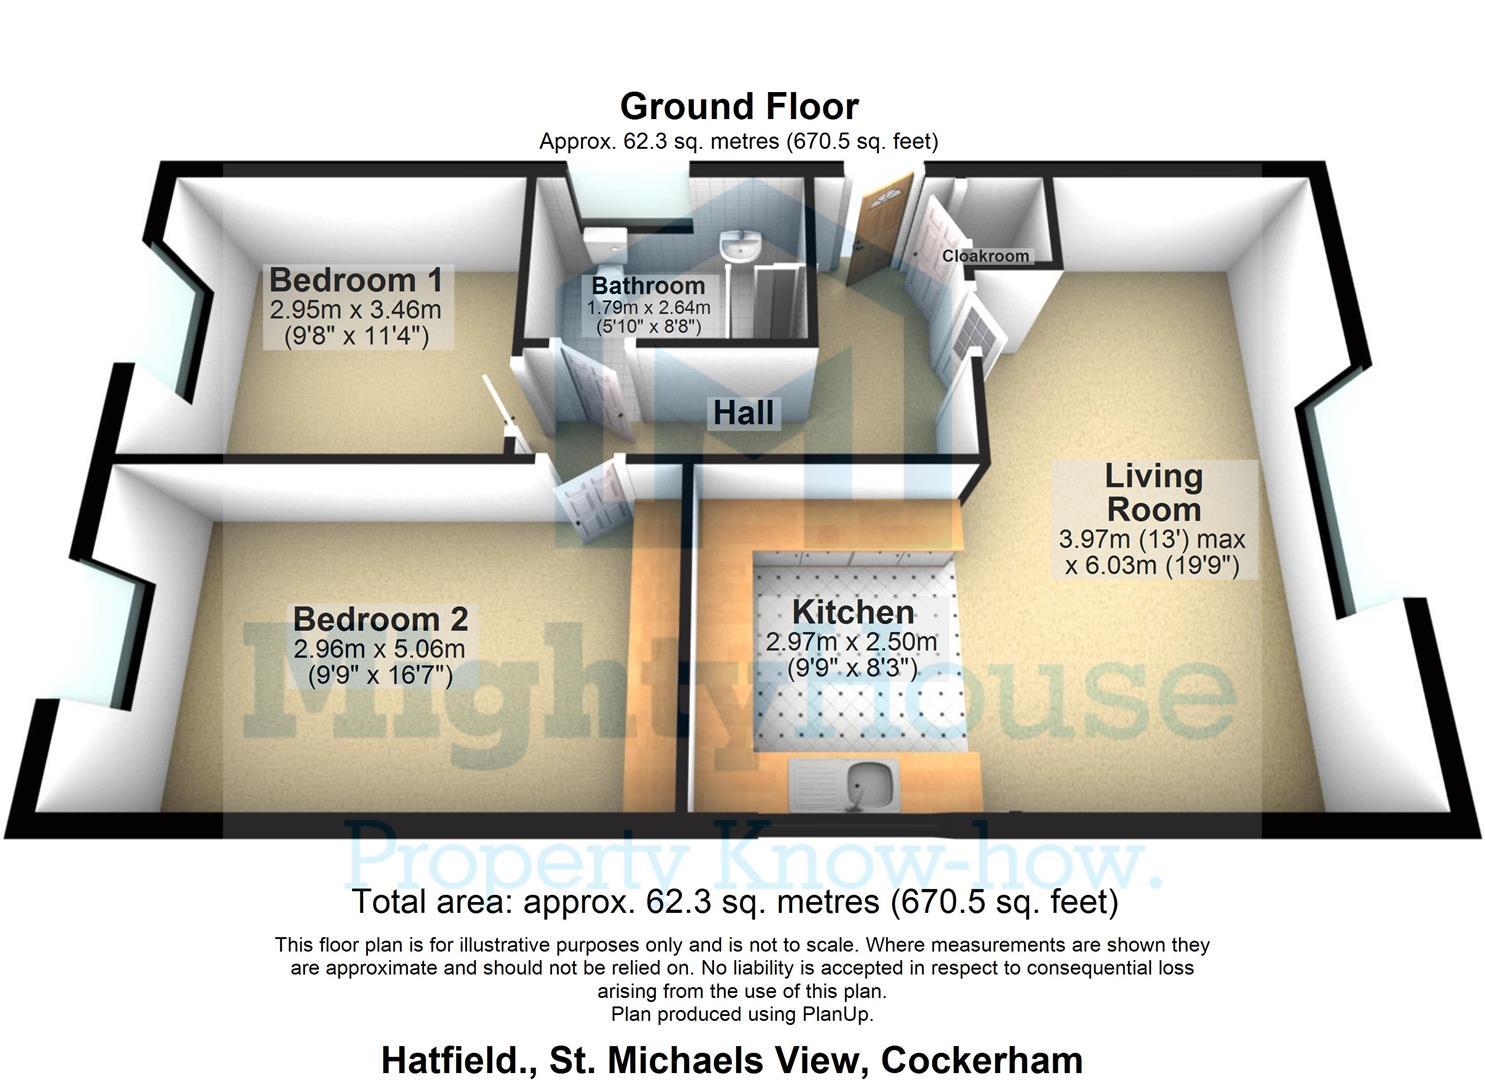 Hatfield, St Michaels View, Cockerham - 3D.JPG